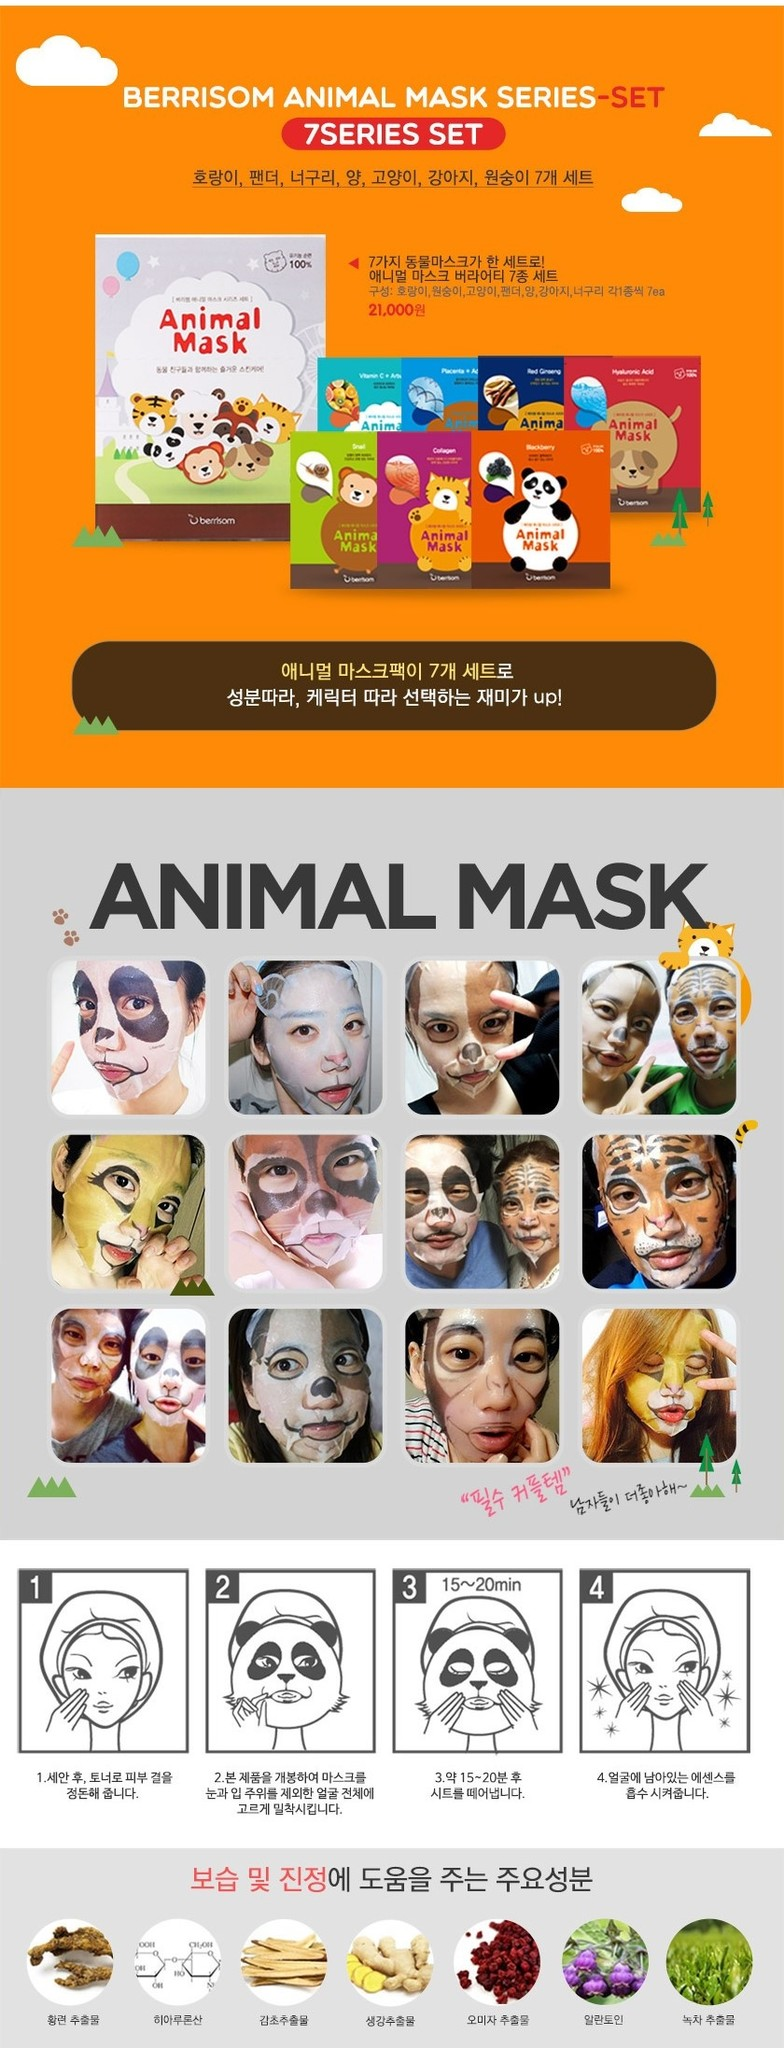 Animal Mask Series - Cat-6